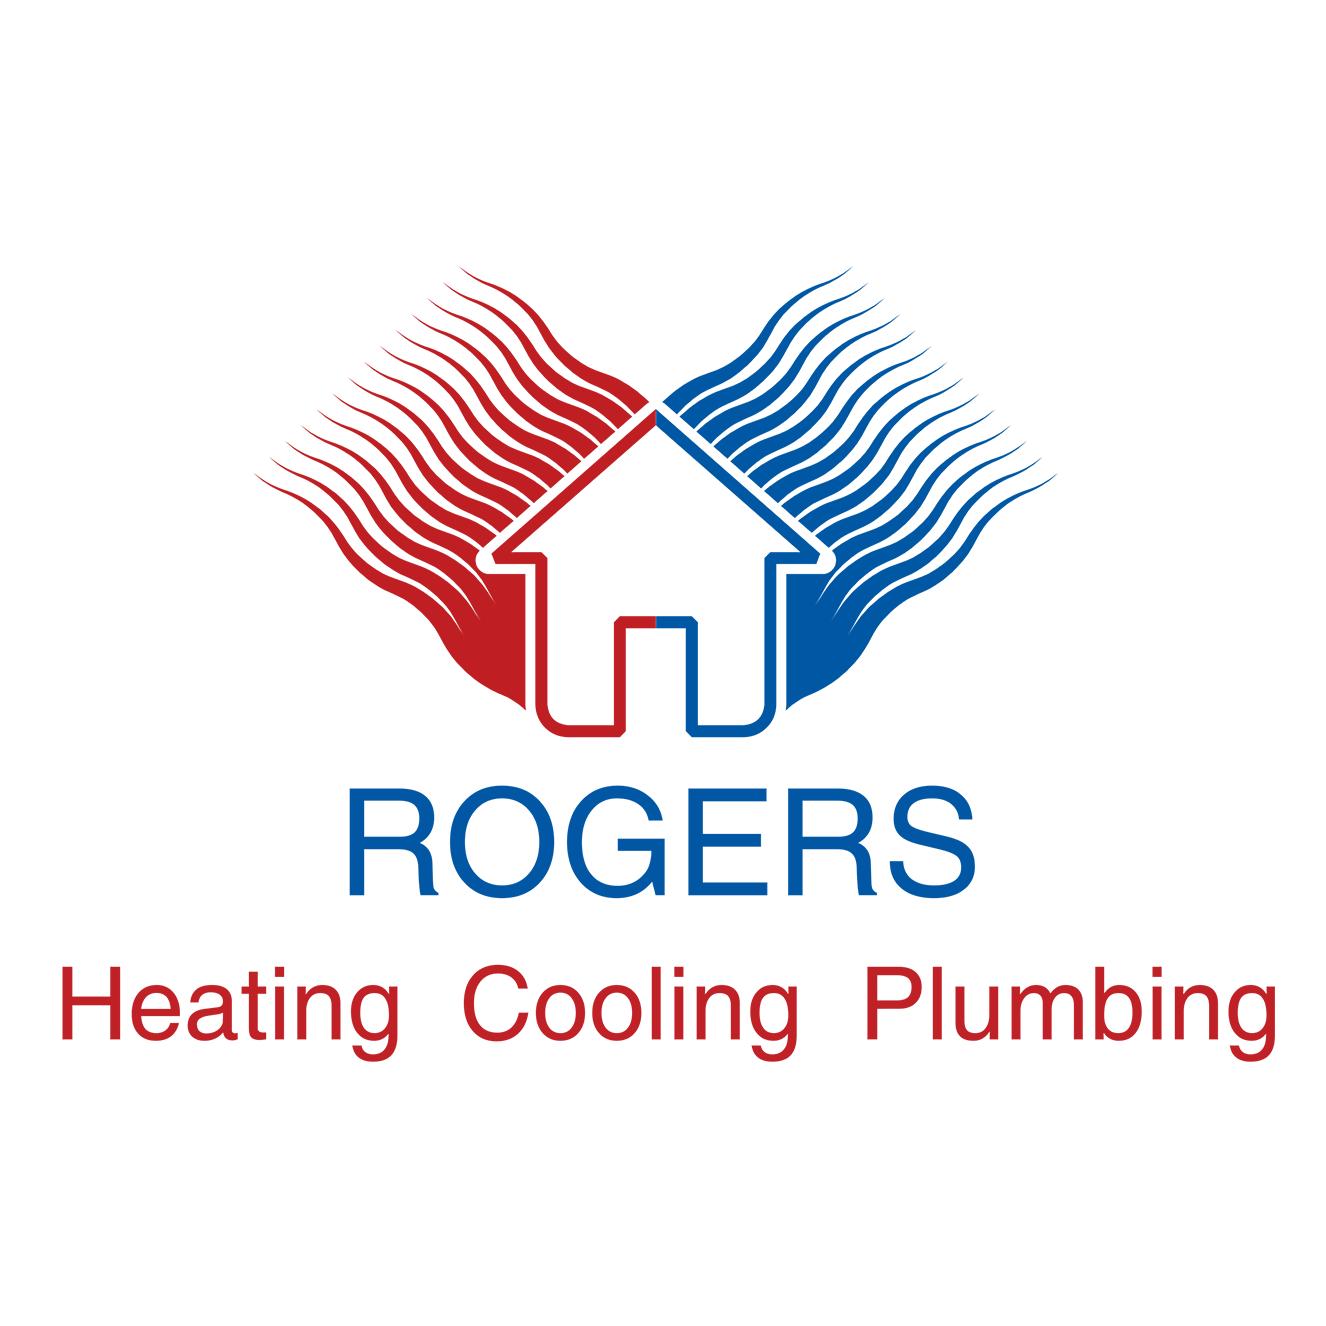 Rogers Heating, Cooling, & Plumbing